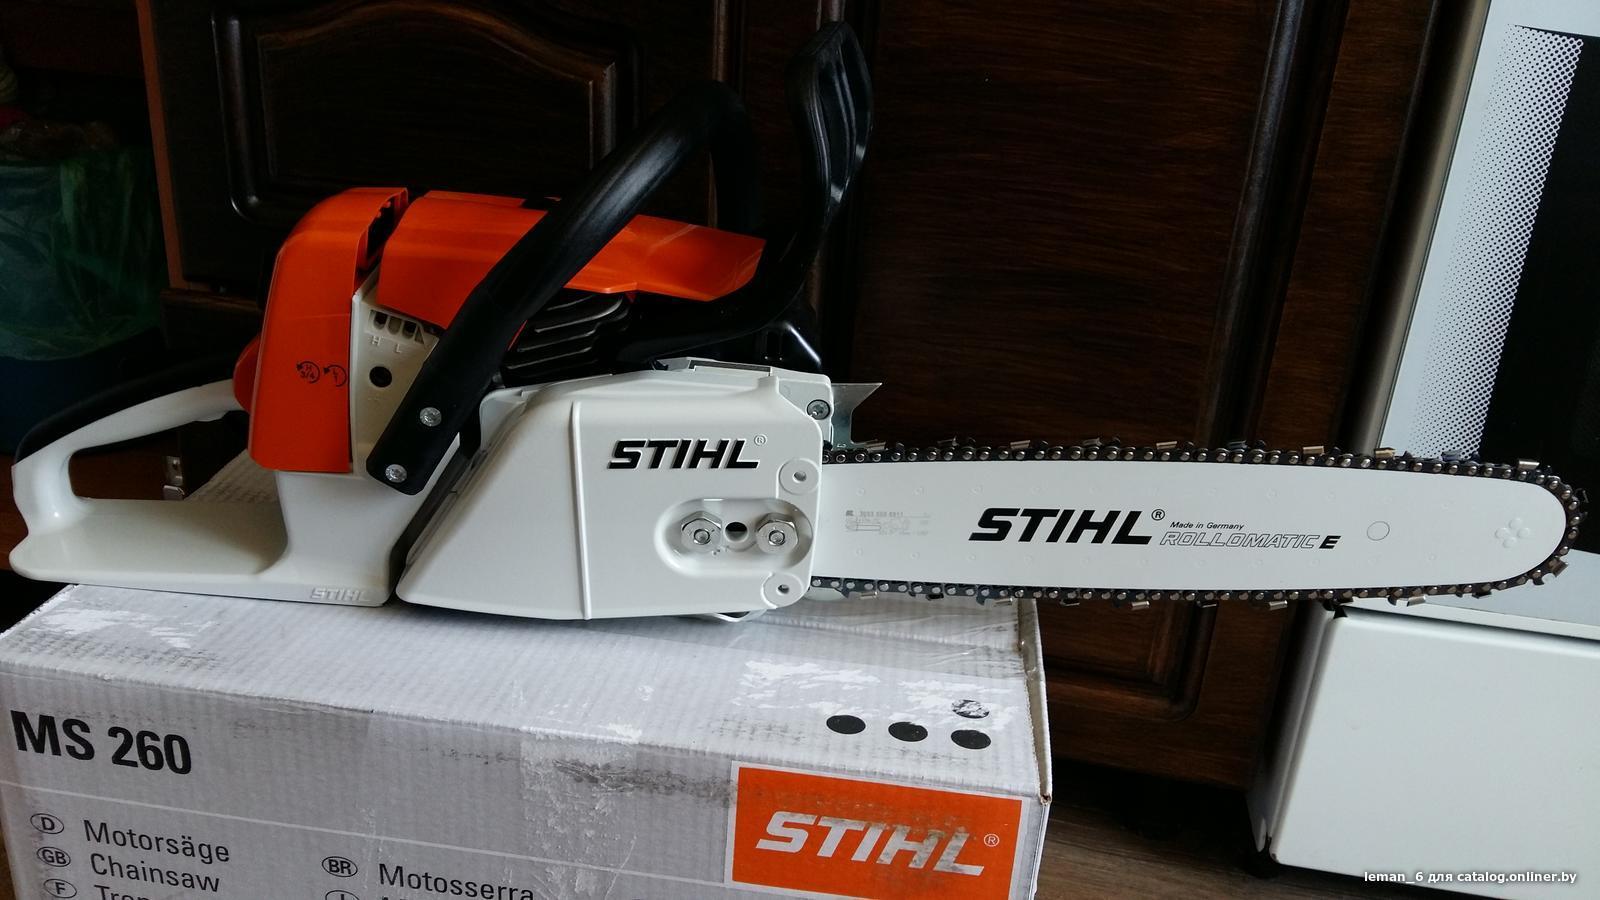 Бензопила stihl ms 261: обзор, характеристики, отзывы